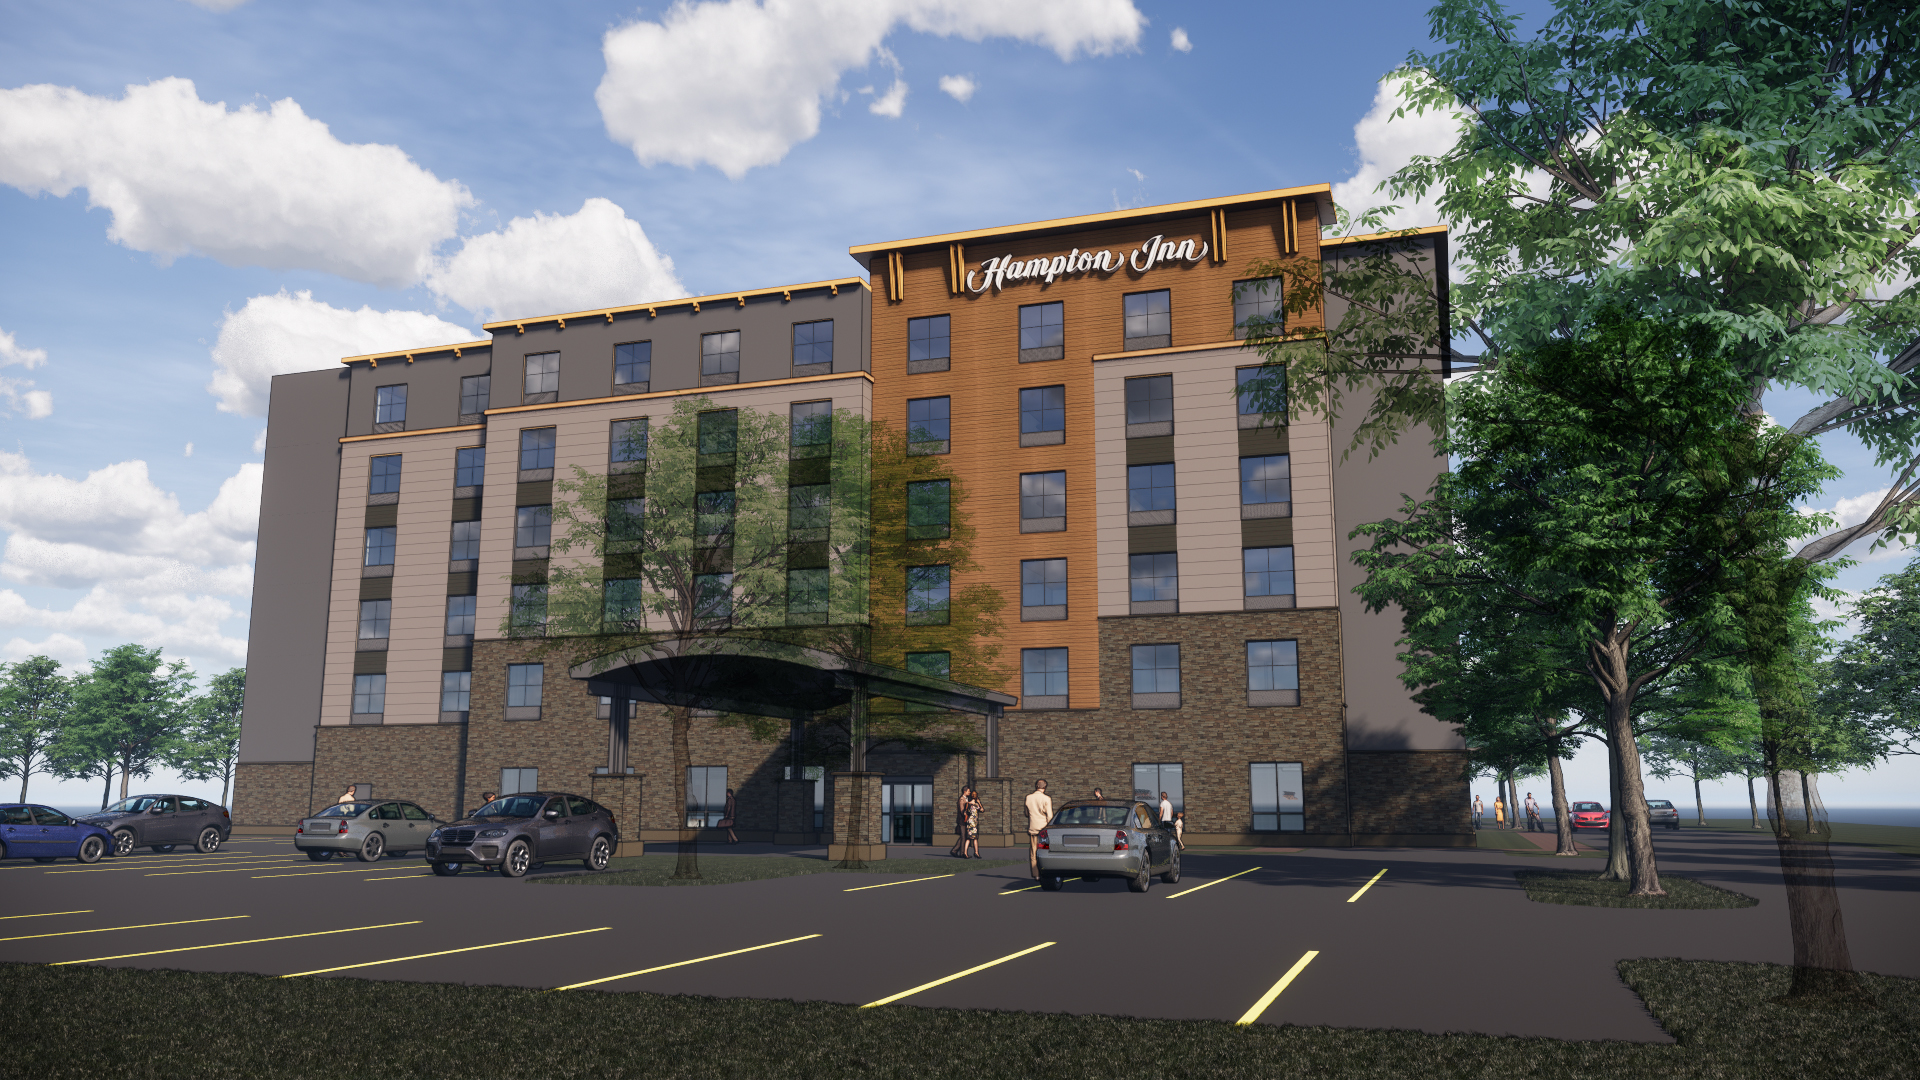 New major chain hotel to be built near Turning Stone Casino Resort